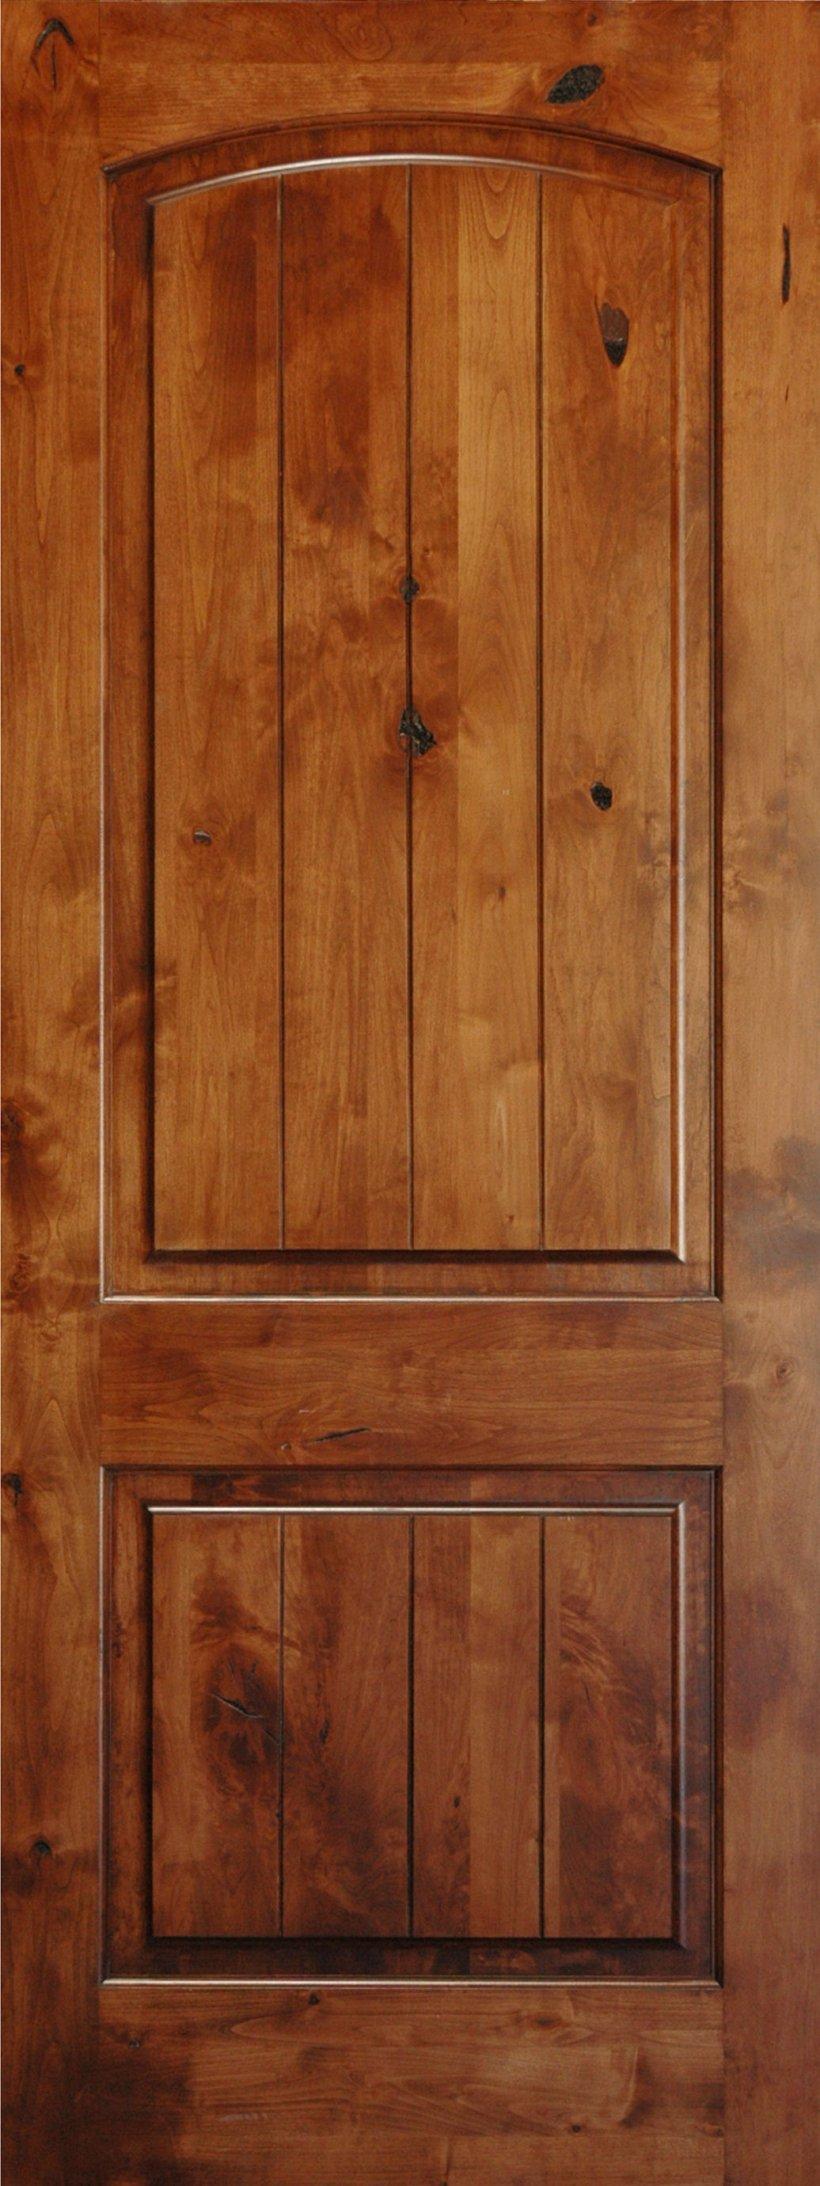 Door Solid Wood Interior Design Services Frame And Panel Png 1036x2763px Window Bathroom Bedroom Cabinetry Cupboard